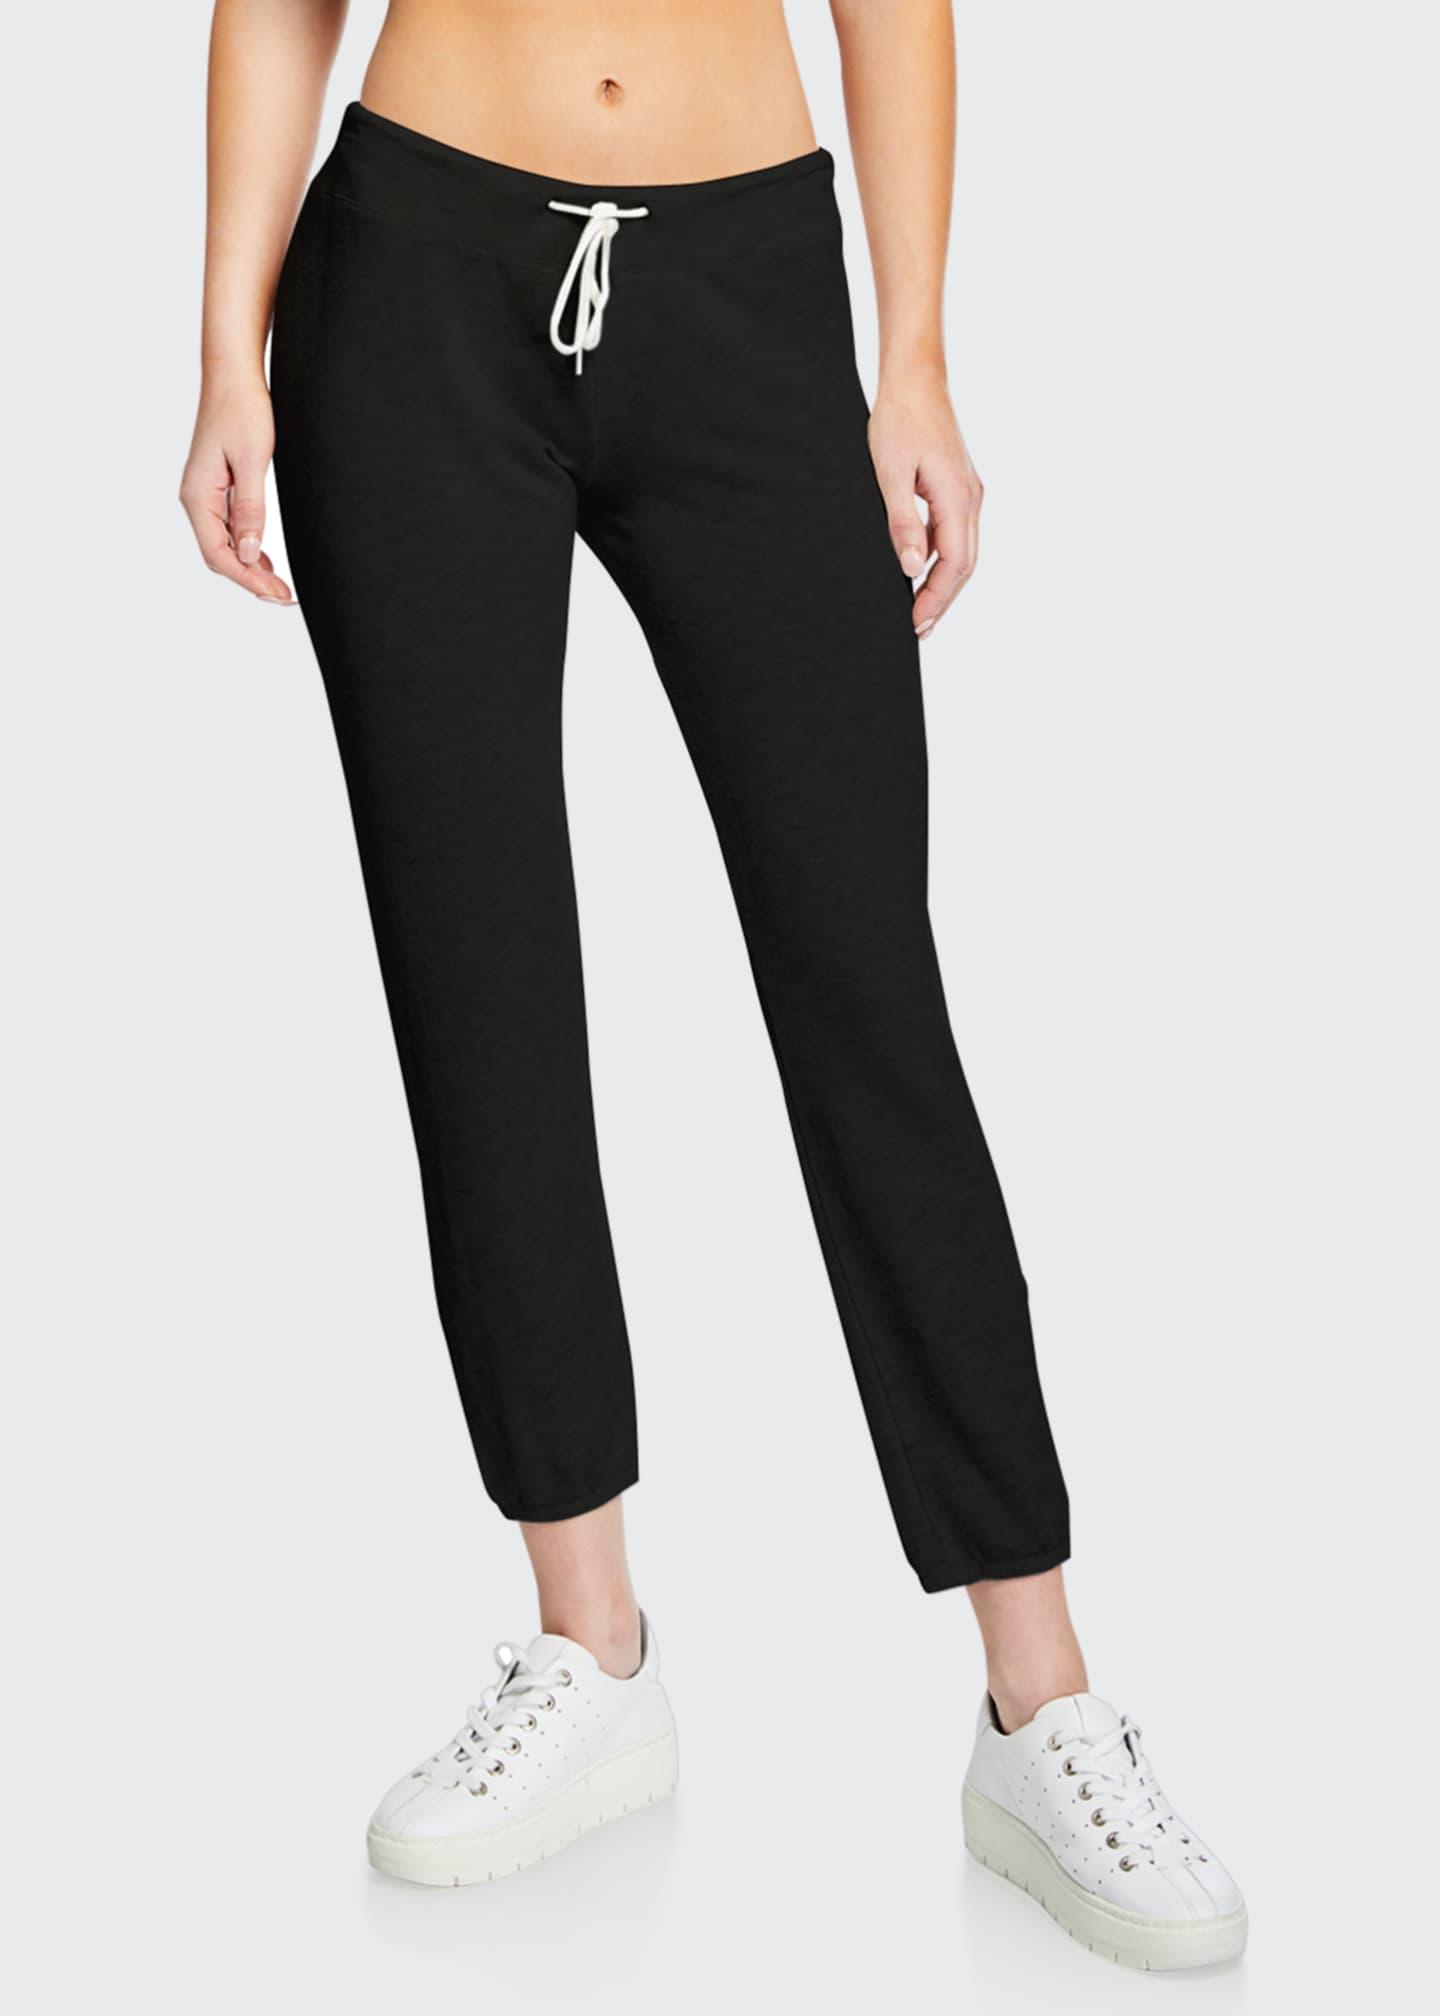 Monrow Super Soft Vintage Drawstring Sweatpants